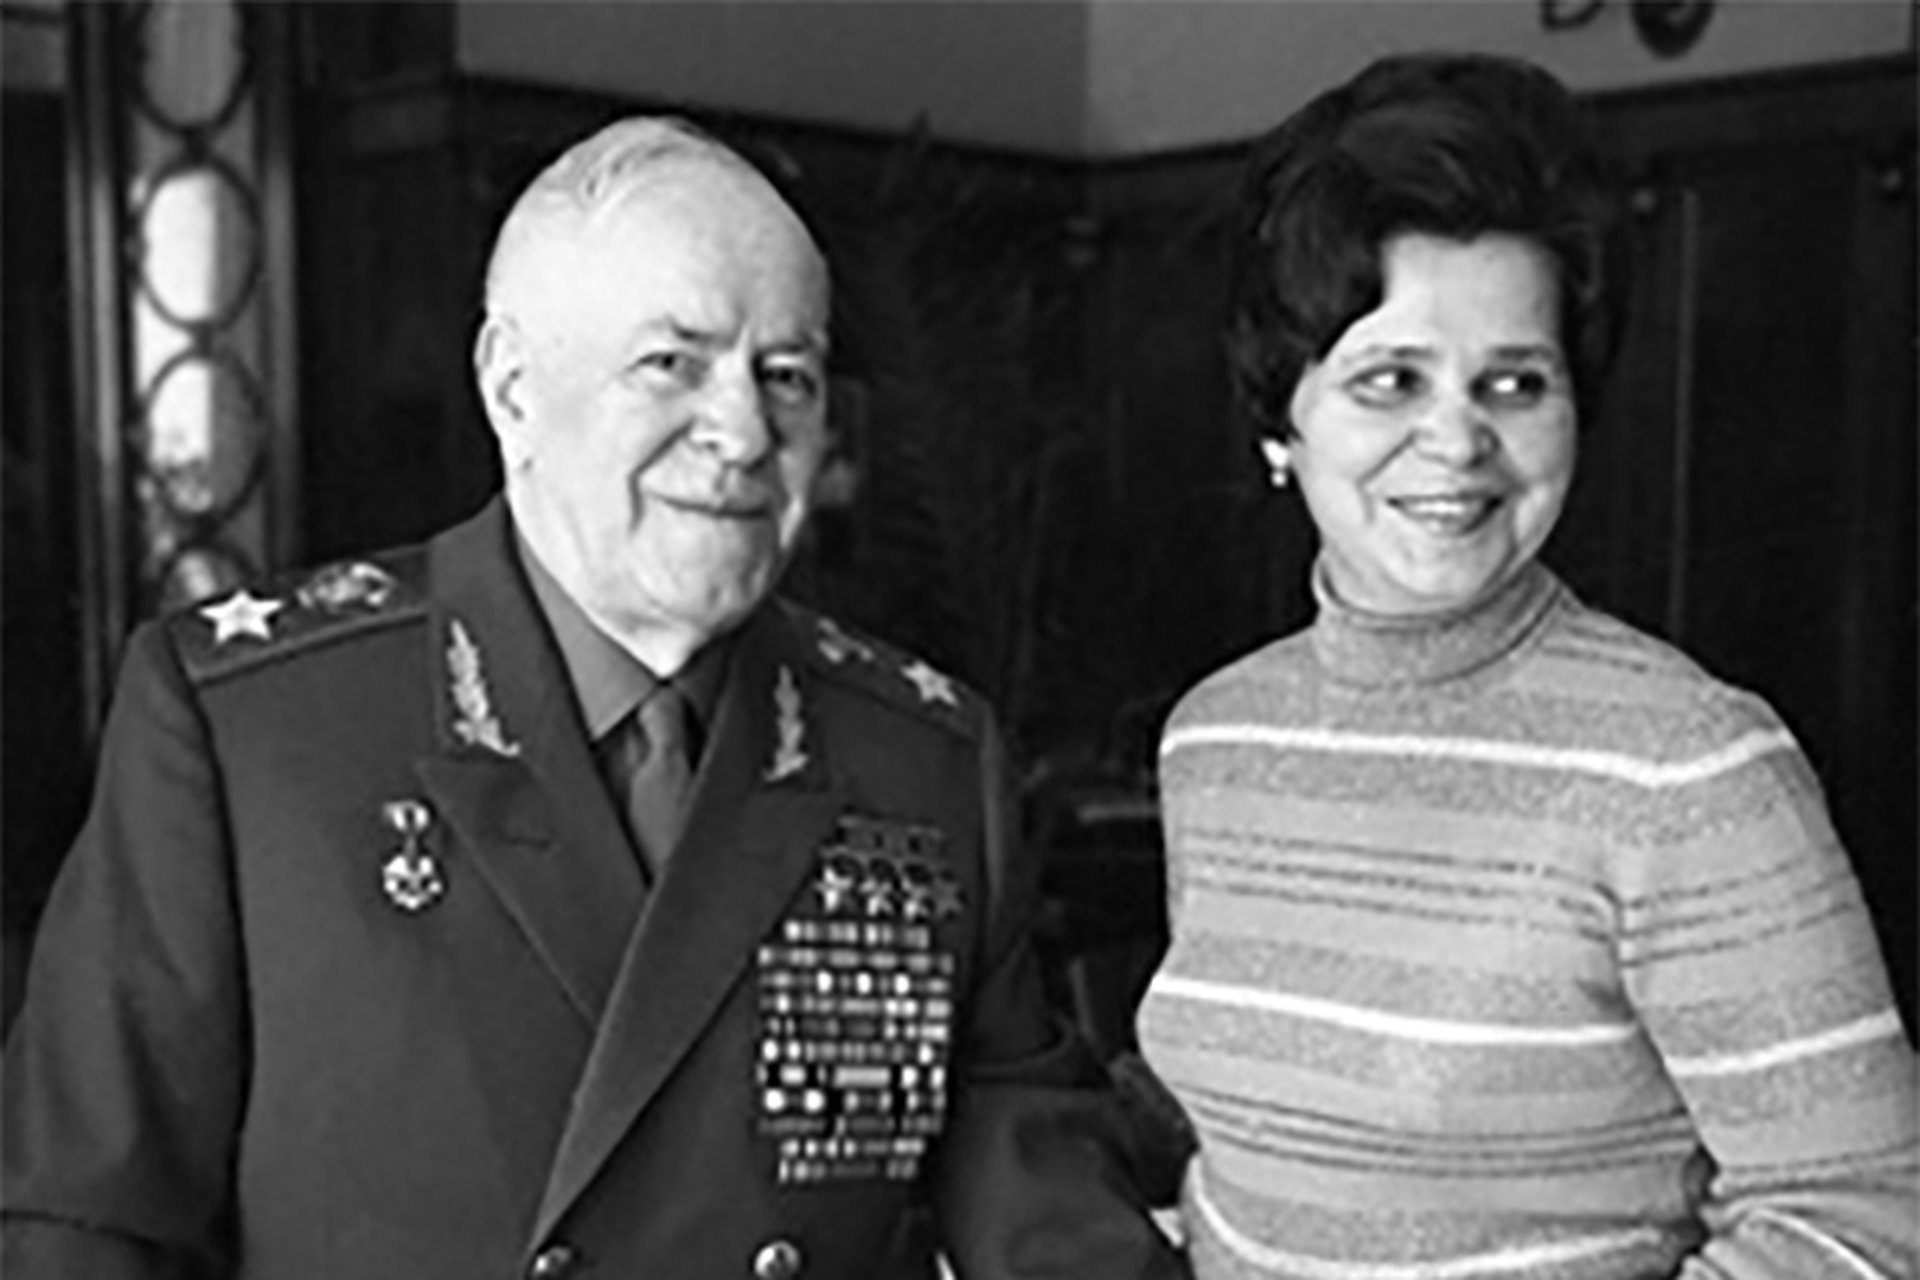 Georgy Zhukov with his last wife Galina.